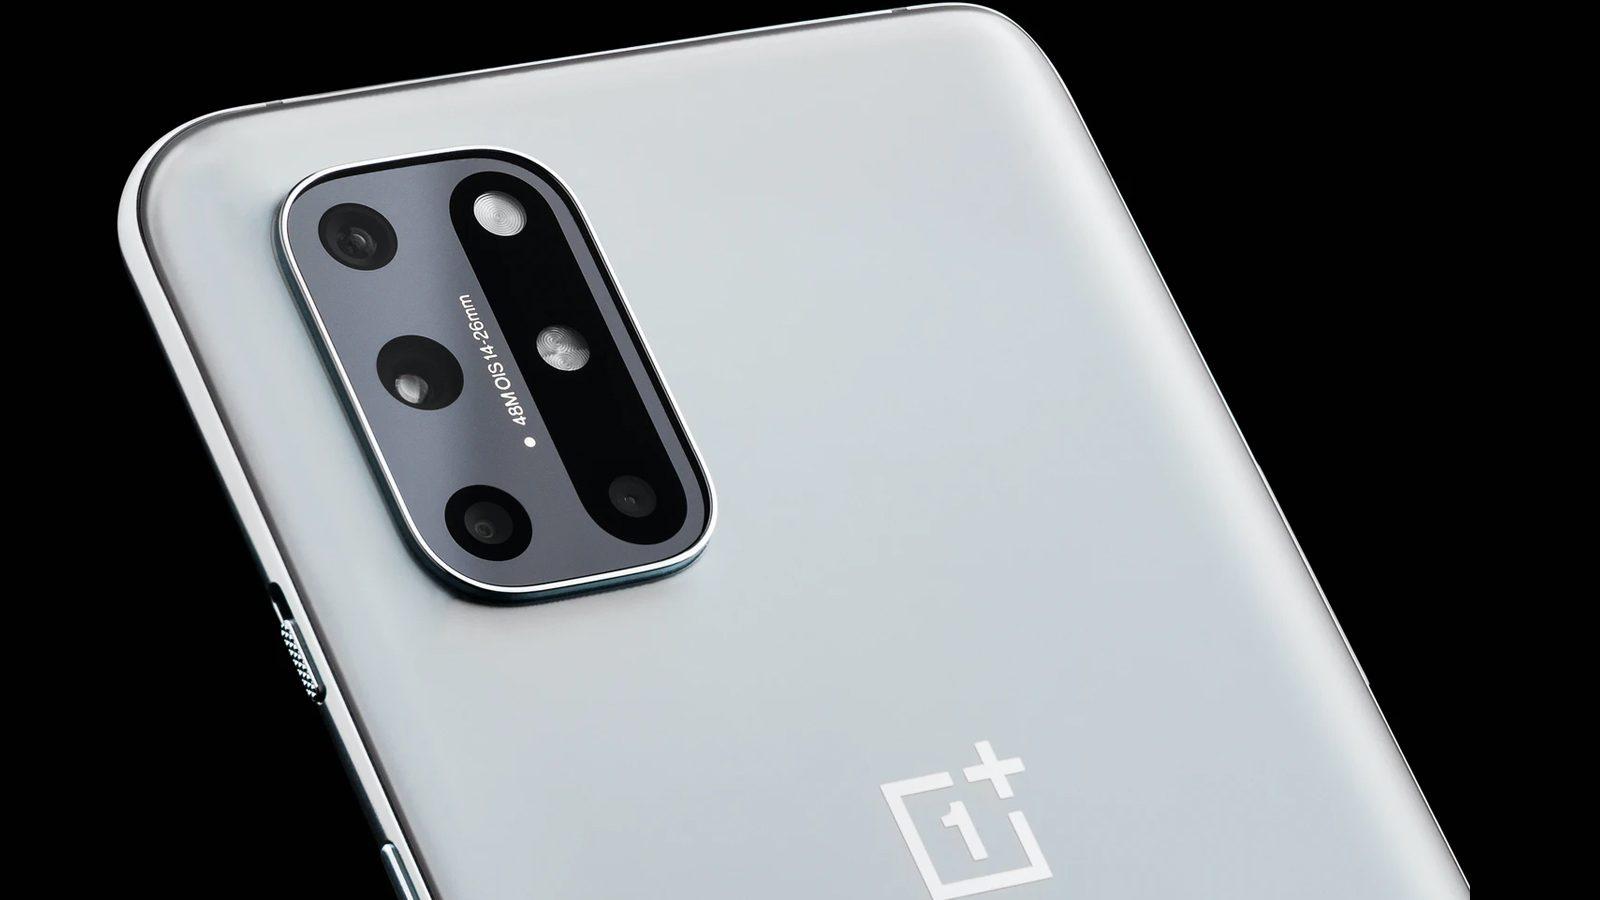 OnePlus Smartphone Market